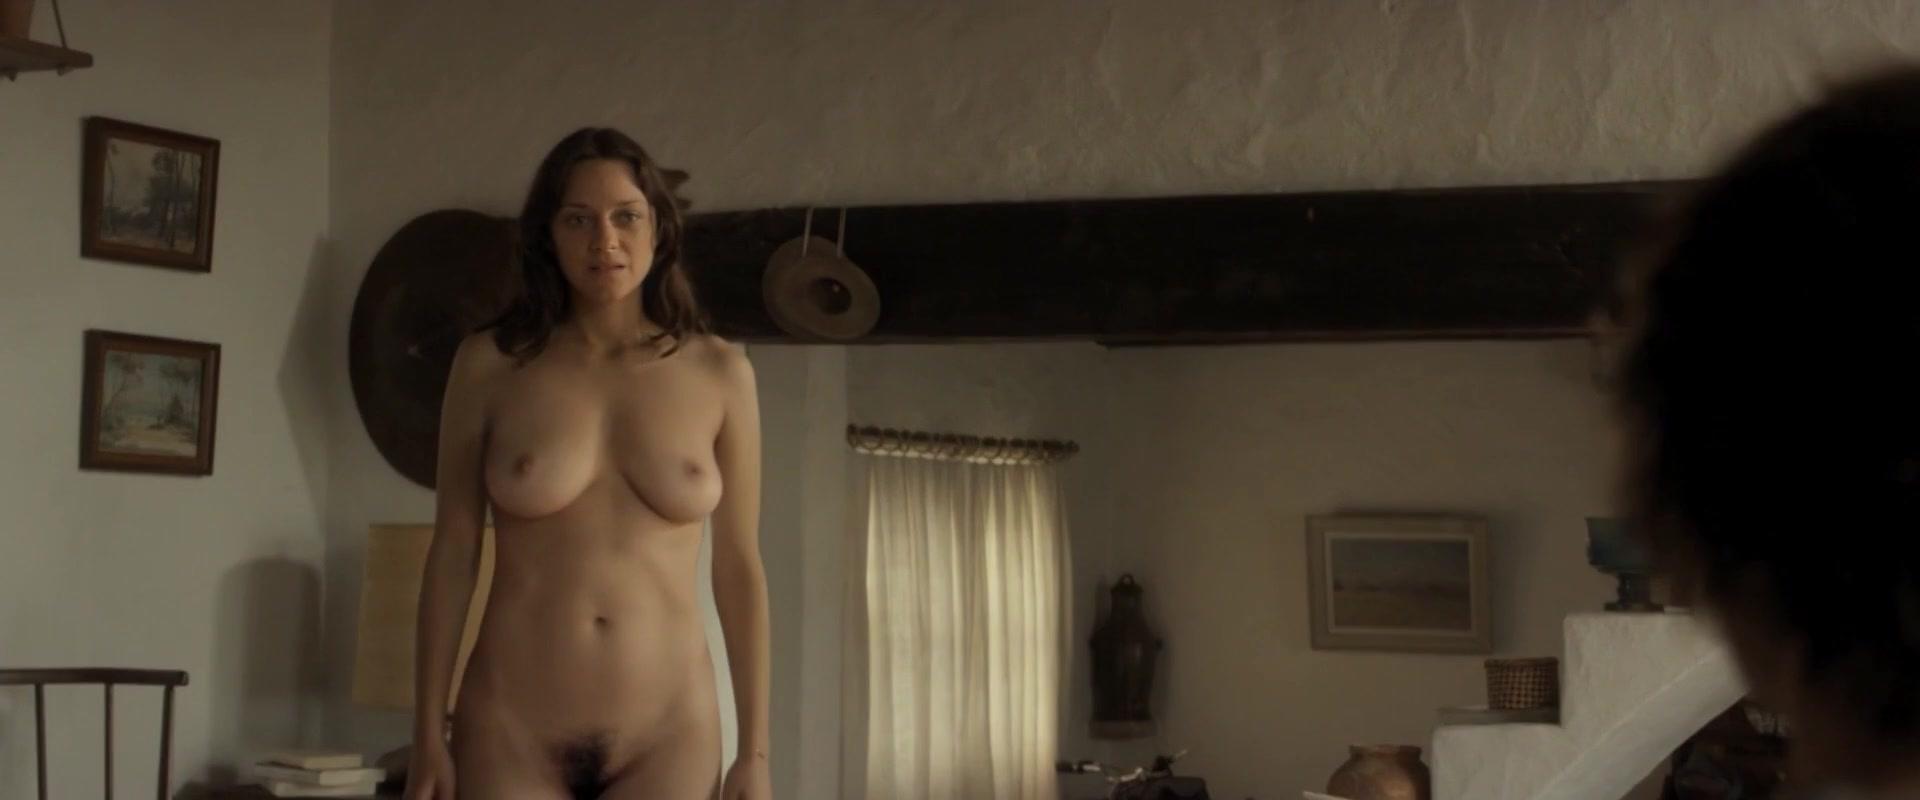 the most unusual russian porn